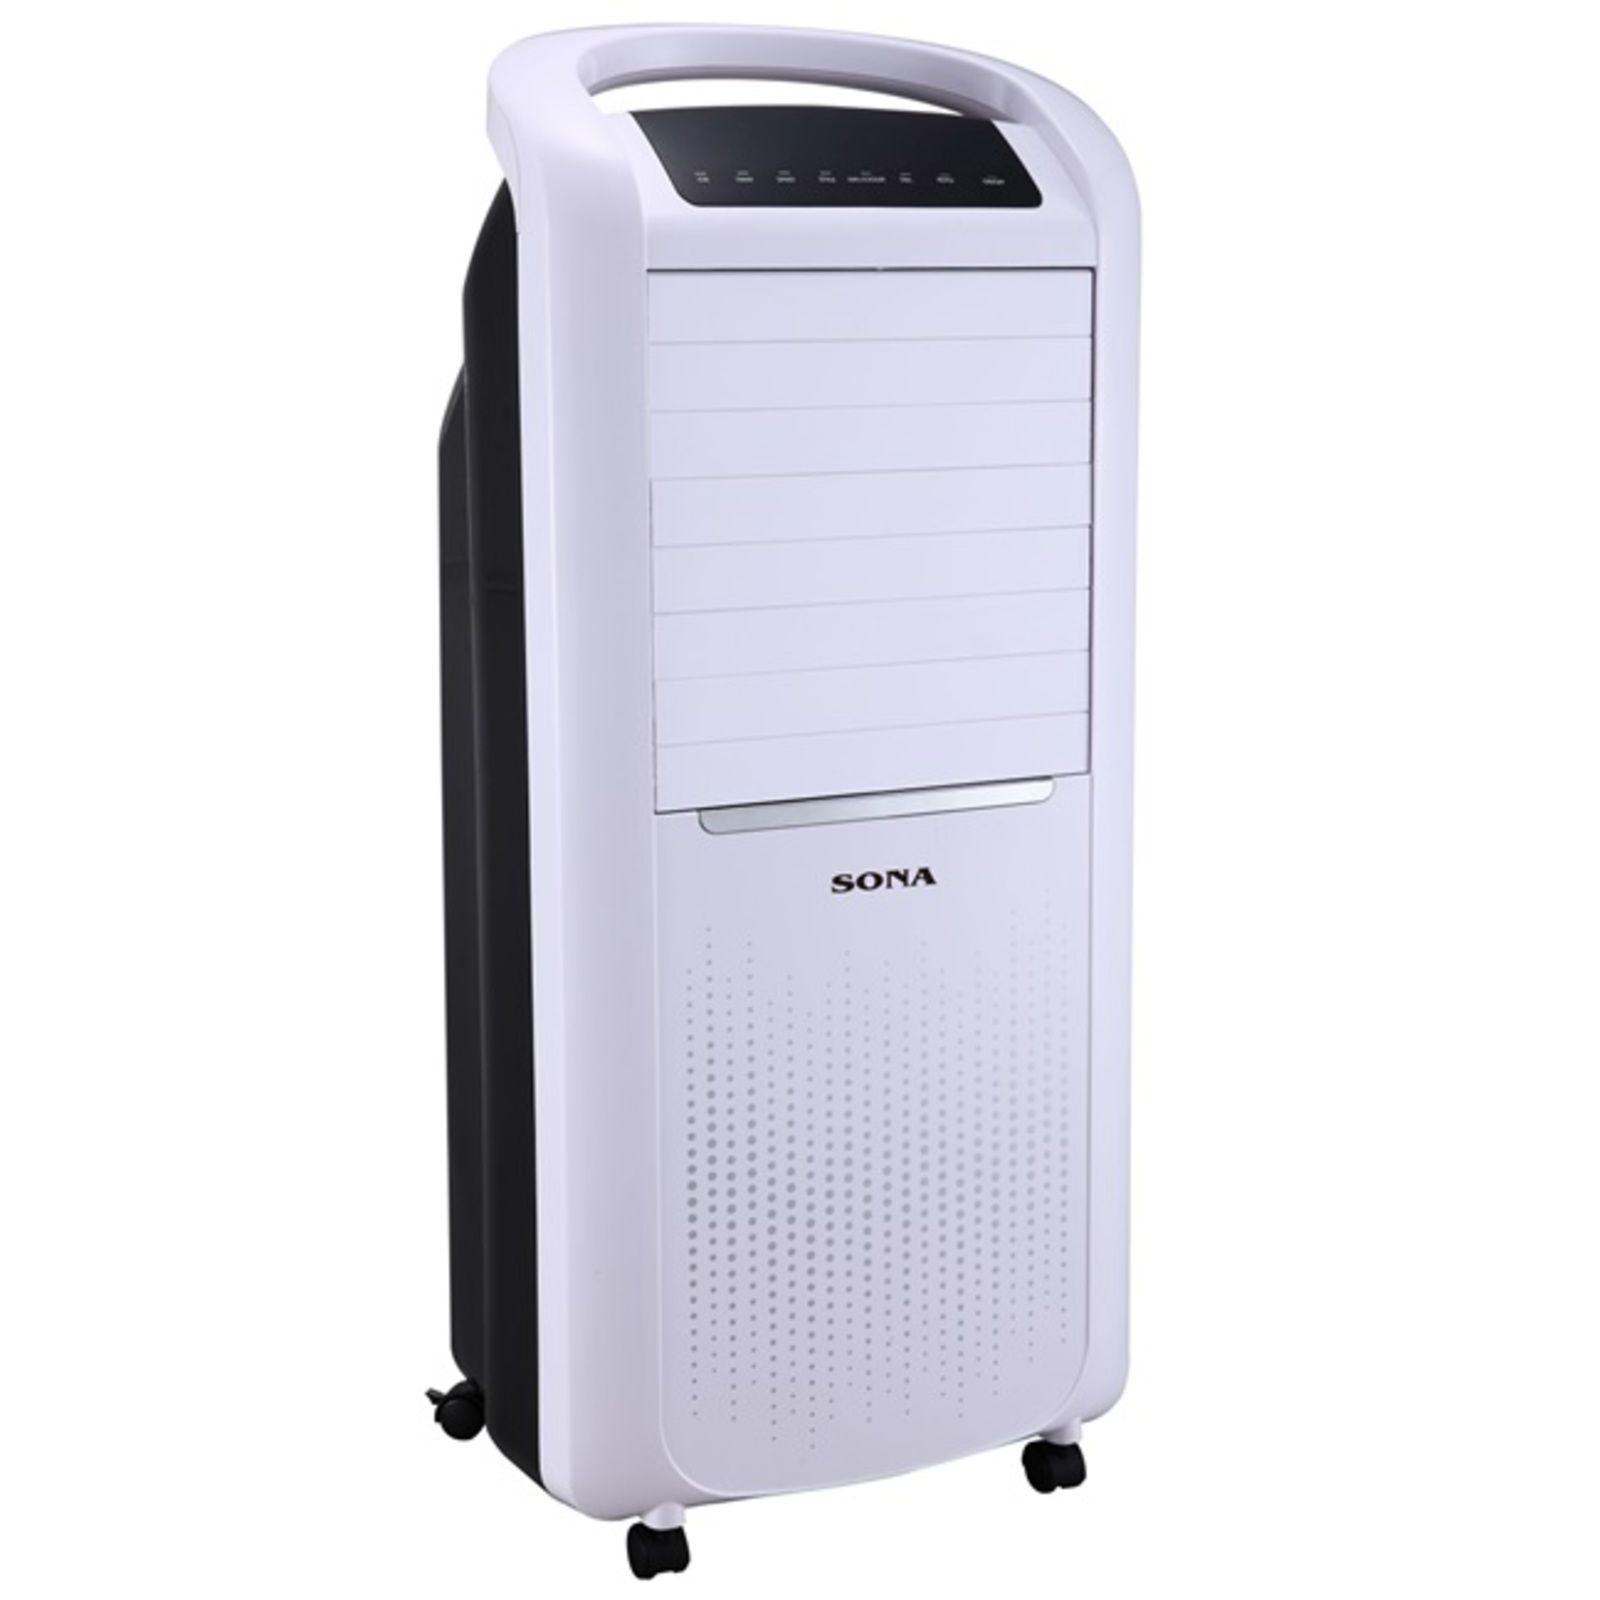 Sona SAC6029 Remote Air Cooler